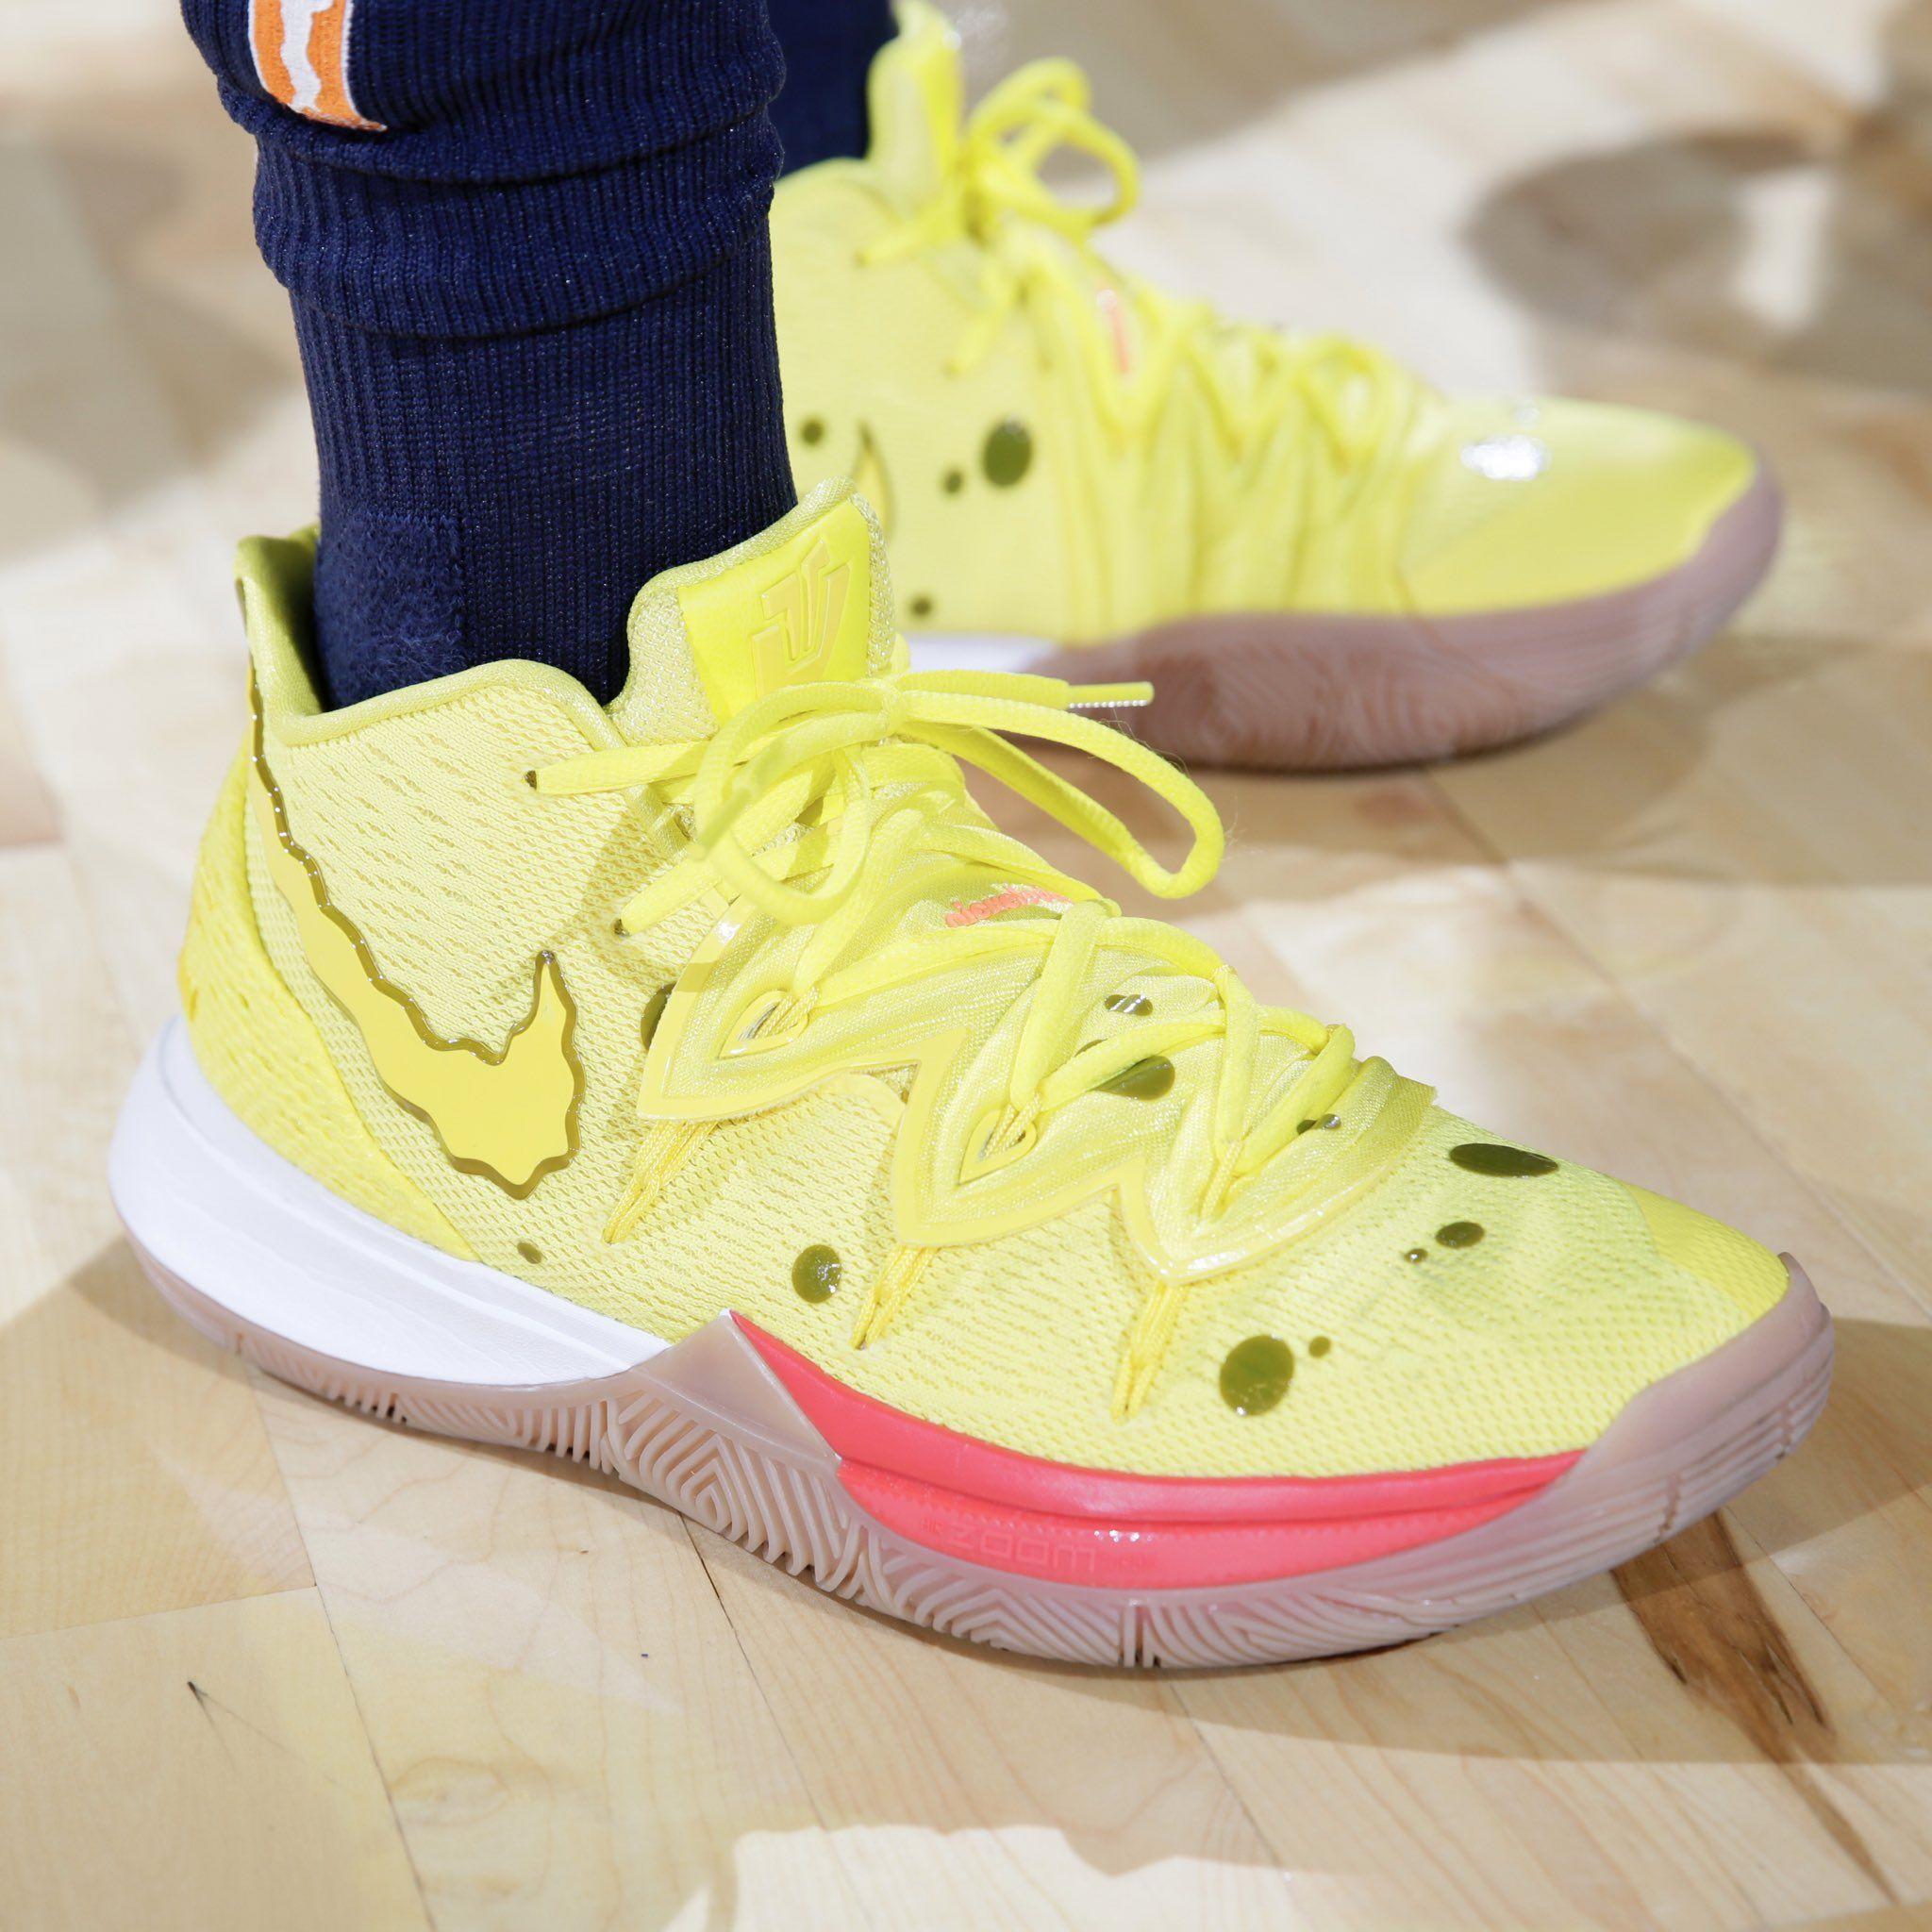 Nike, Nike air shoes, Nike kyrie